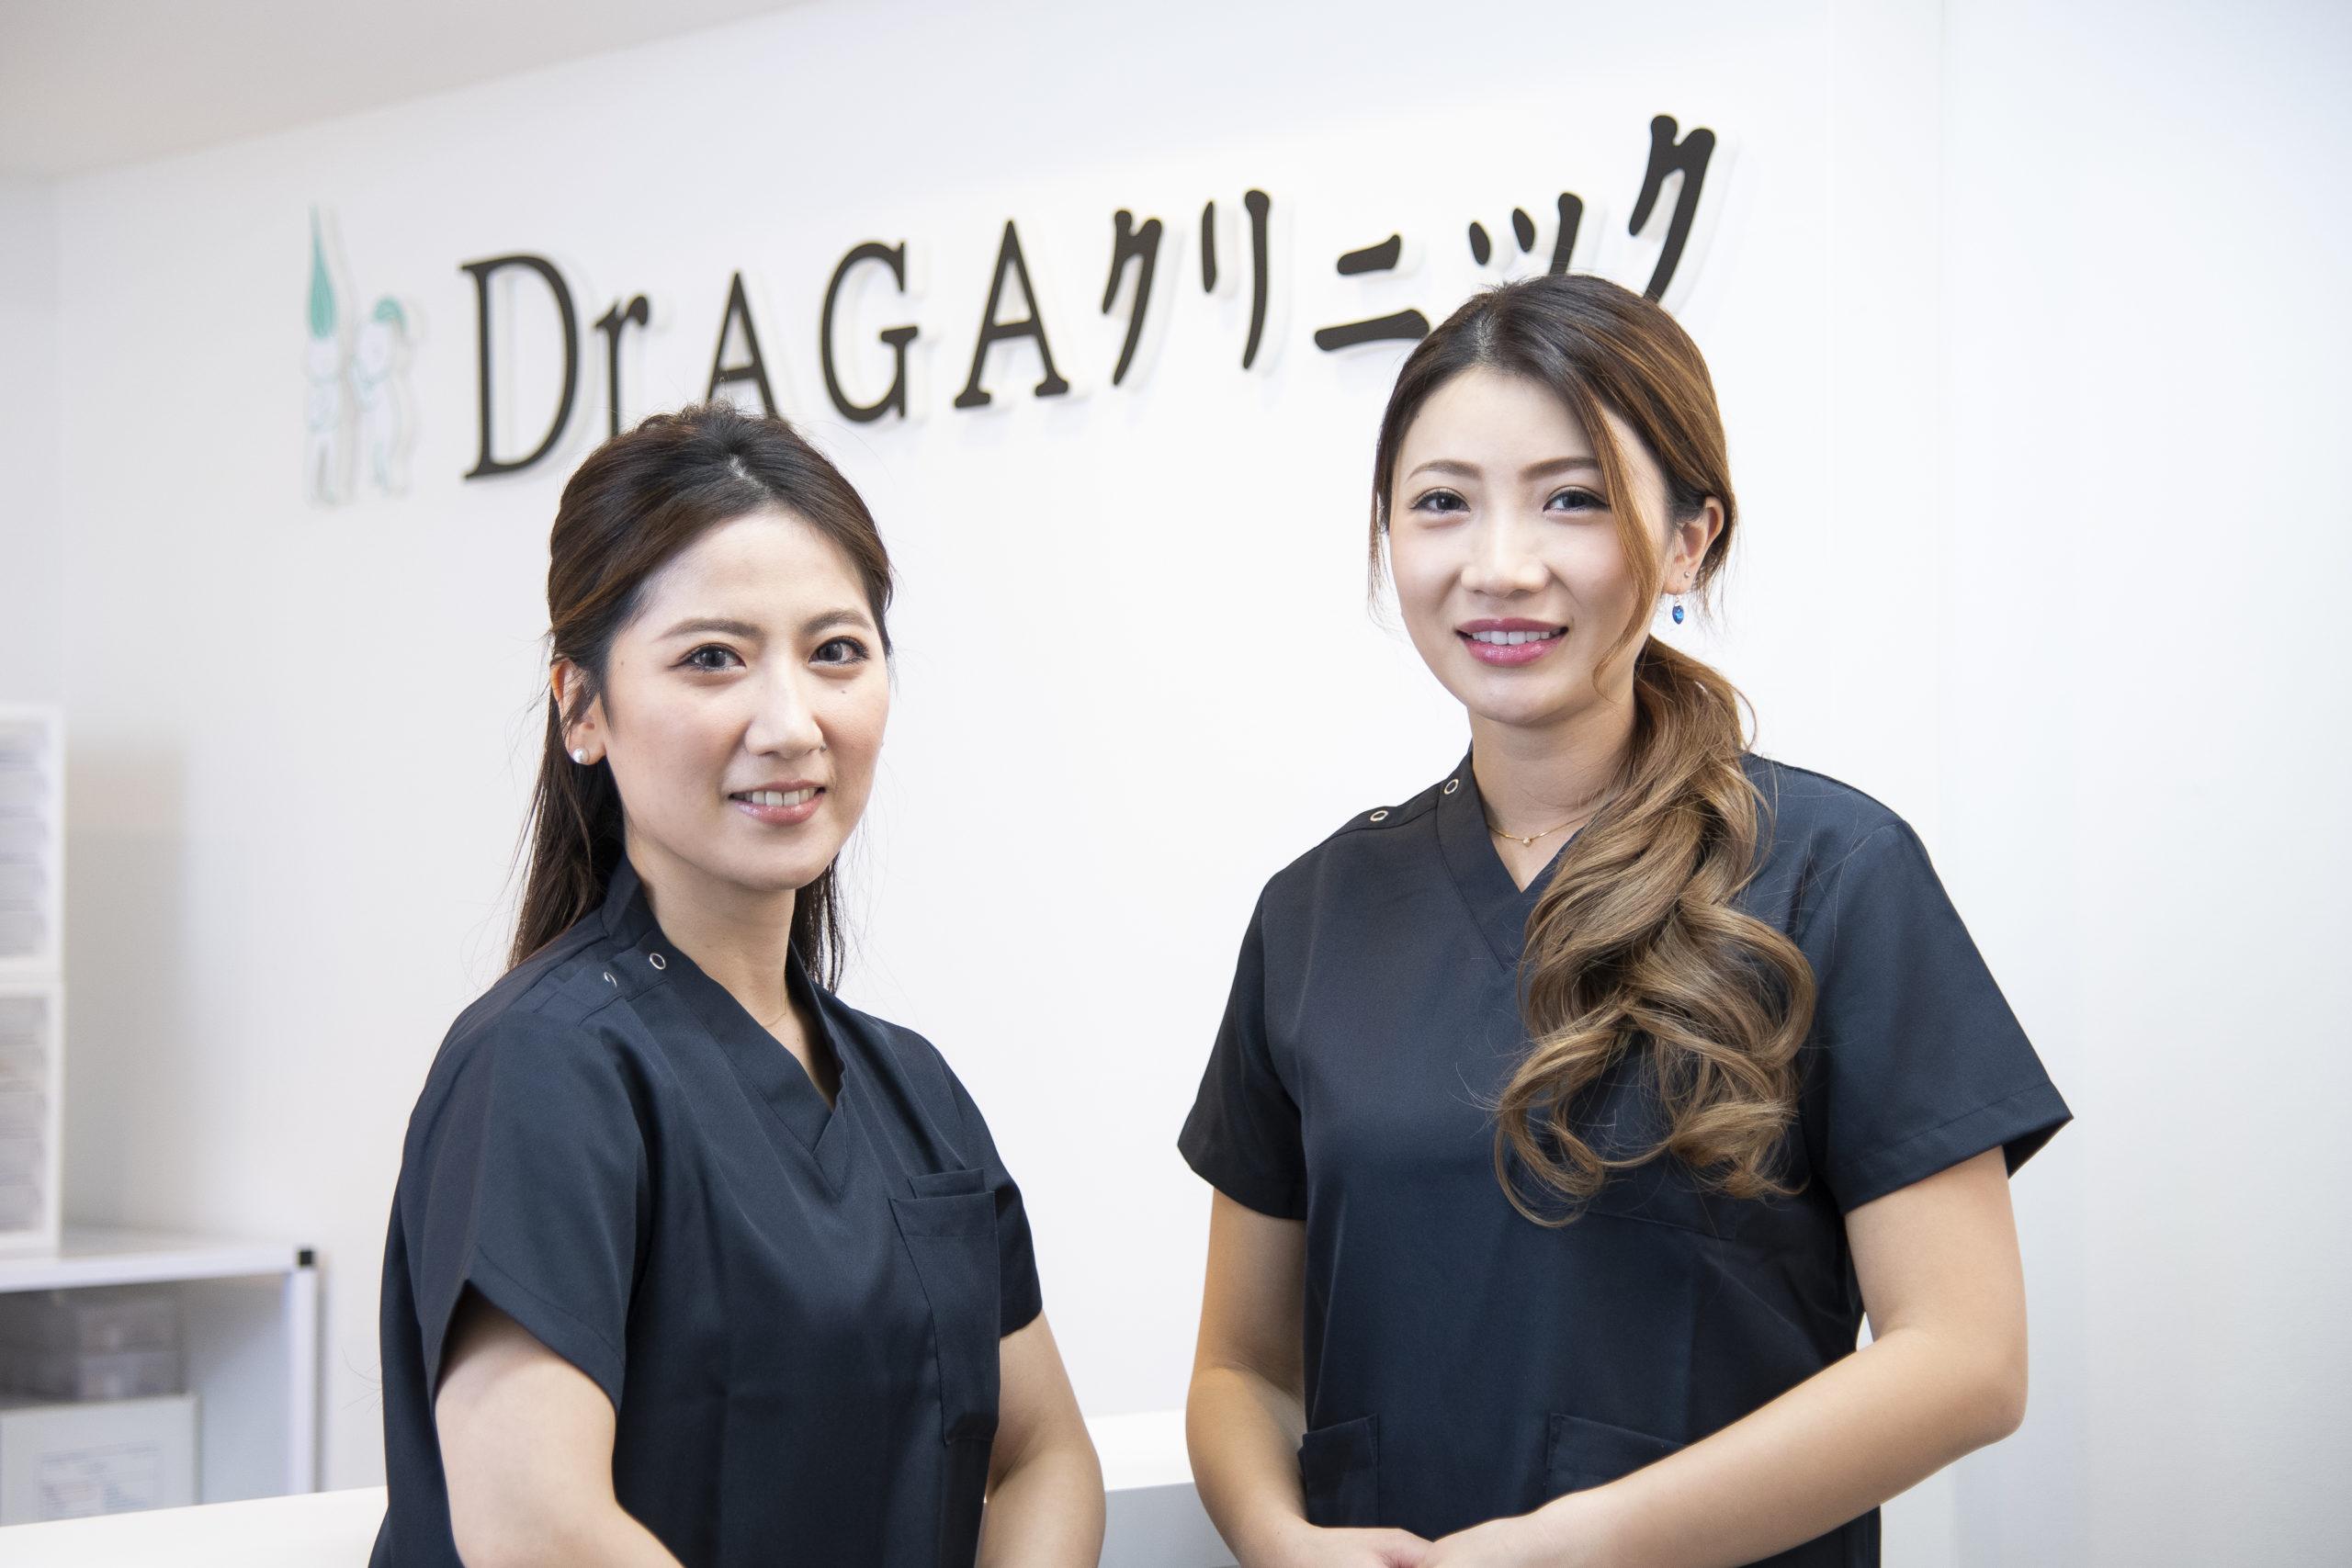 Dr.AGAクリニック東京新橋院・大阪京橋院・大阪天王寺院3院が開院しました。